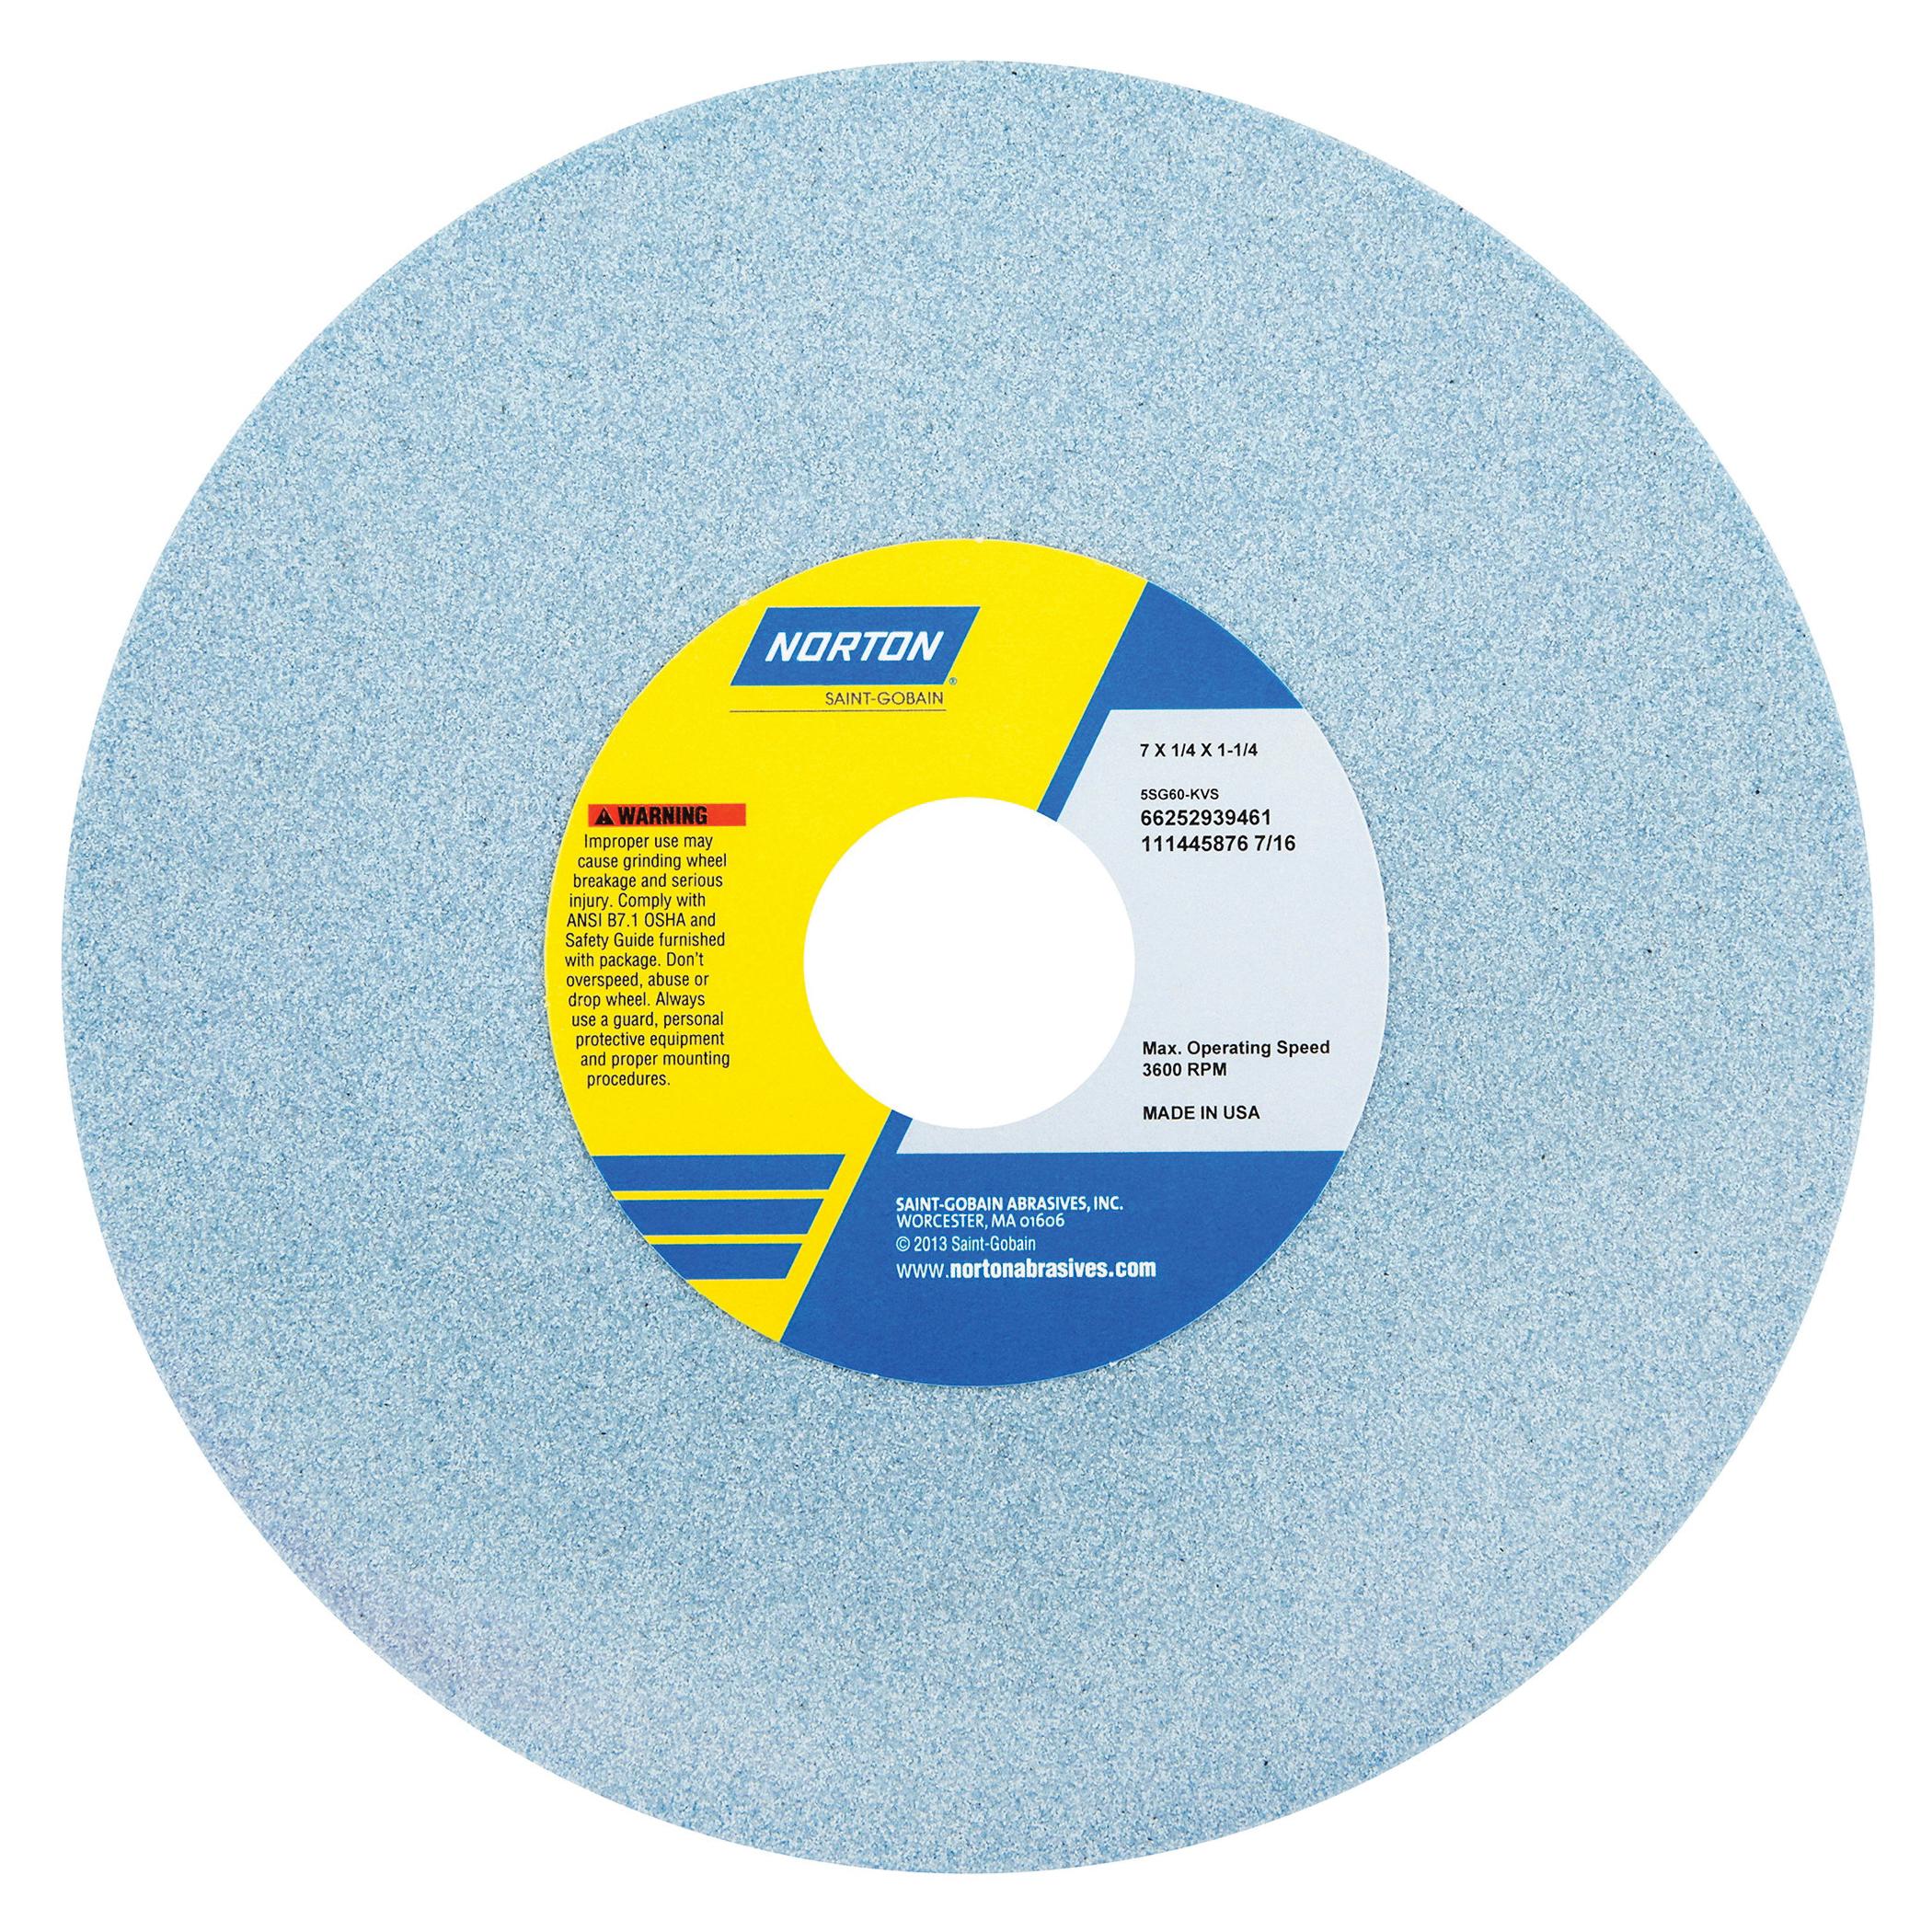 Norton® 66252939468 5SG Straight Toolroom Wheel, 7 in Dia x 1/4 in THK, 1-1/4 in Center Hole, 100 Grit, Ceramic Alumina/Friable Aluminum Oxide Abrasive